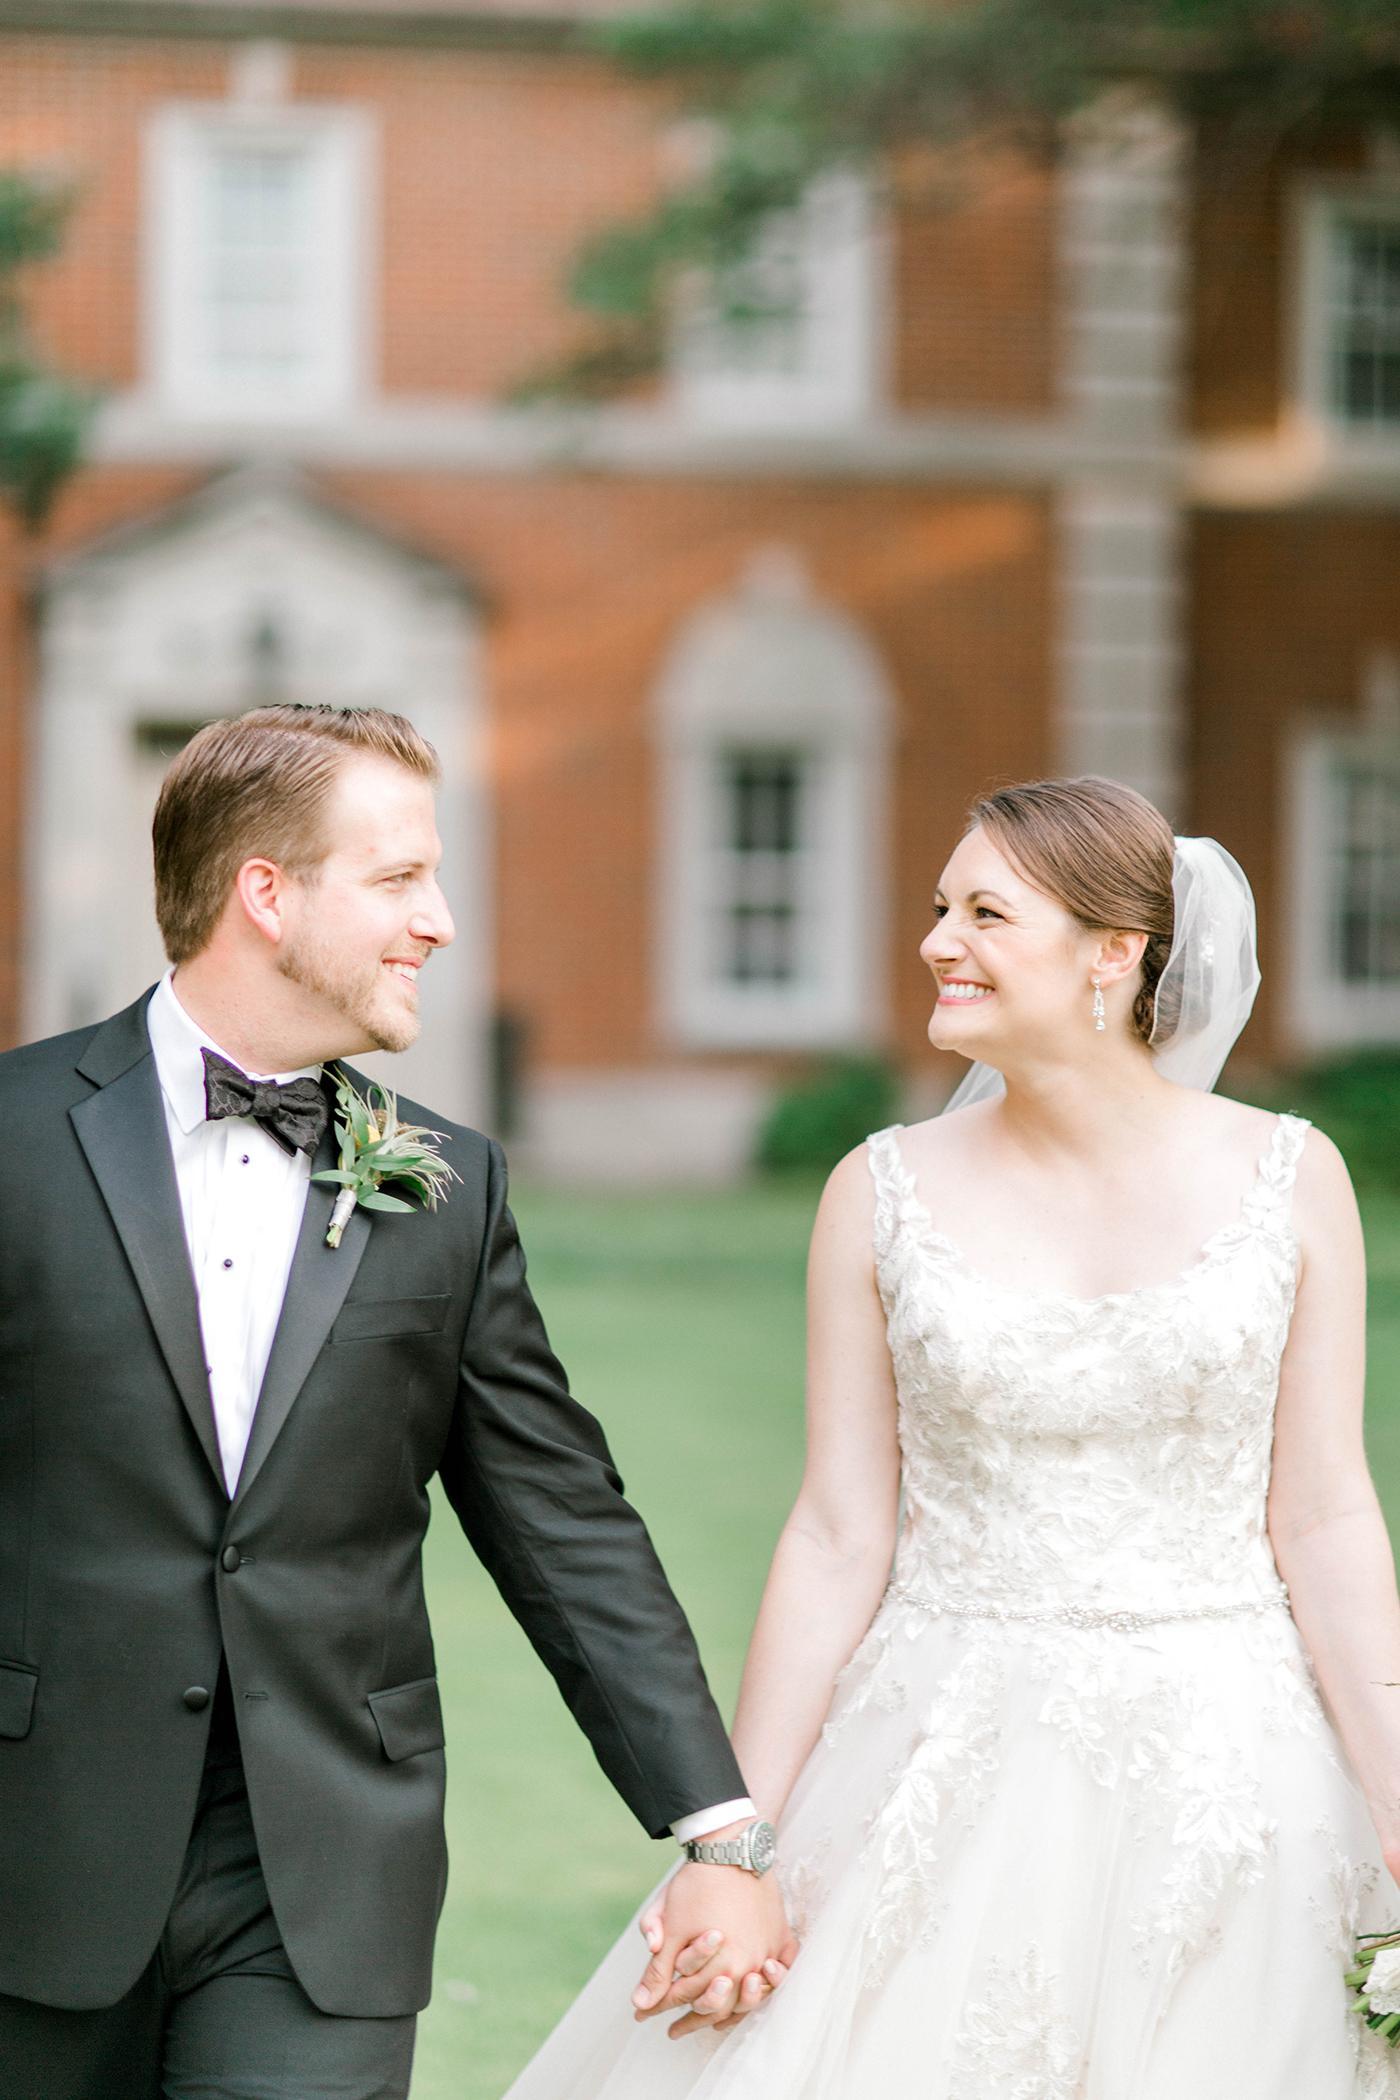 Dallas TX Wedding Planner - Allday Events - Hall on Dragon Wedding - 00049.jpg